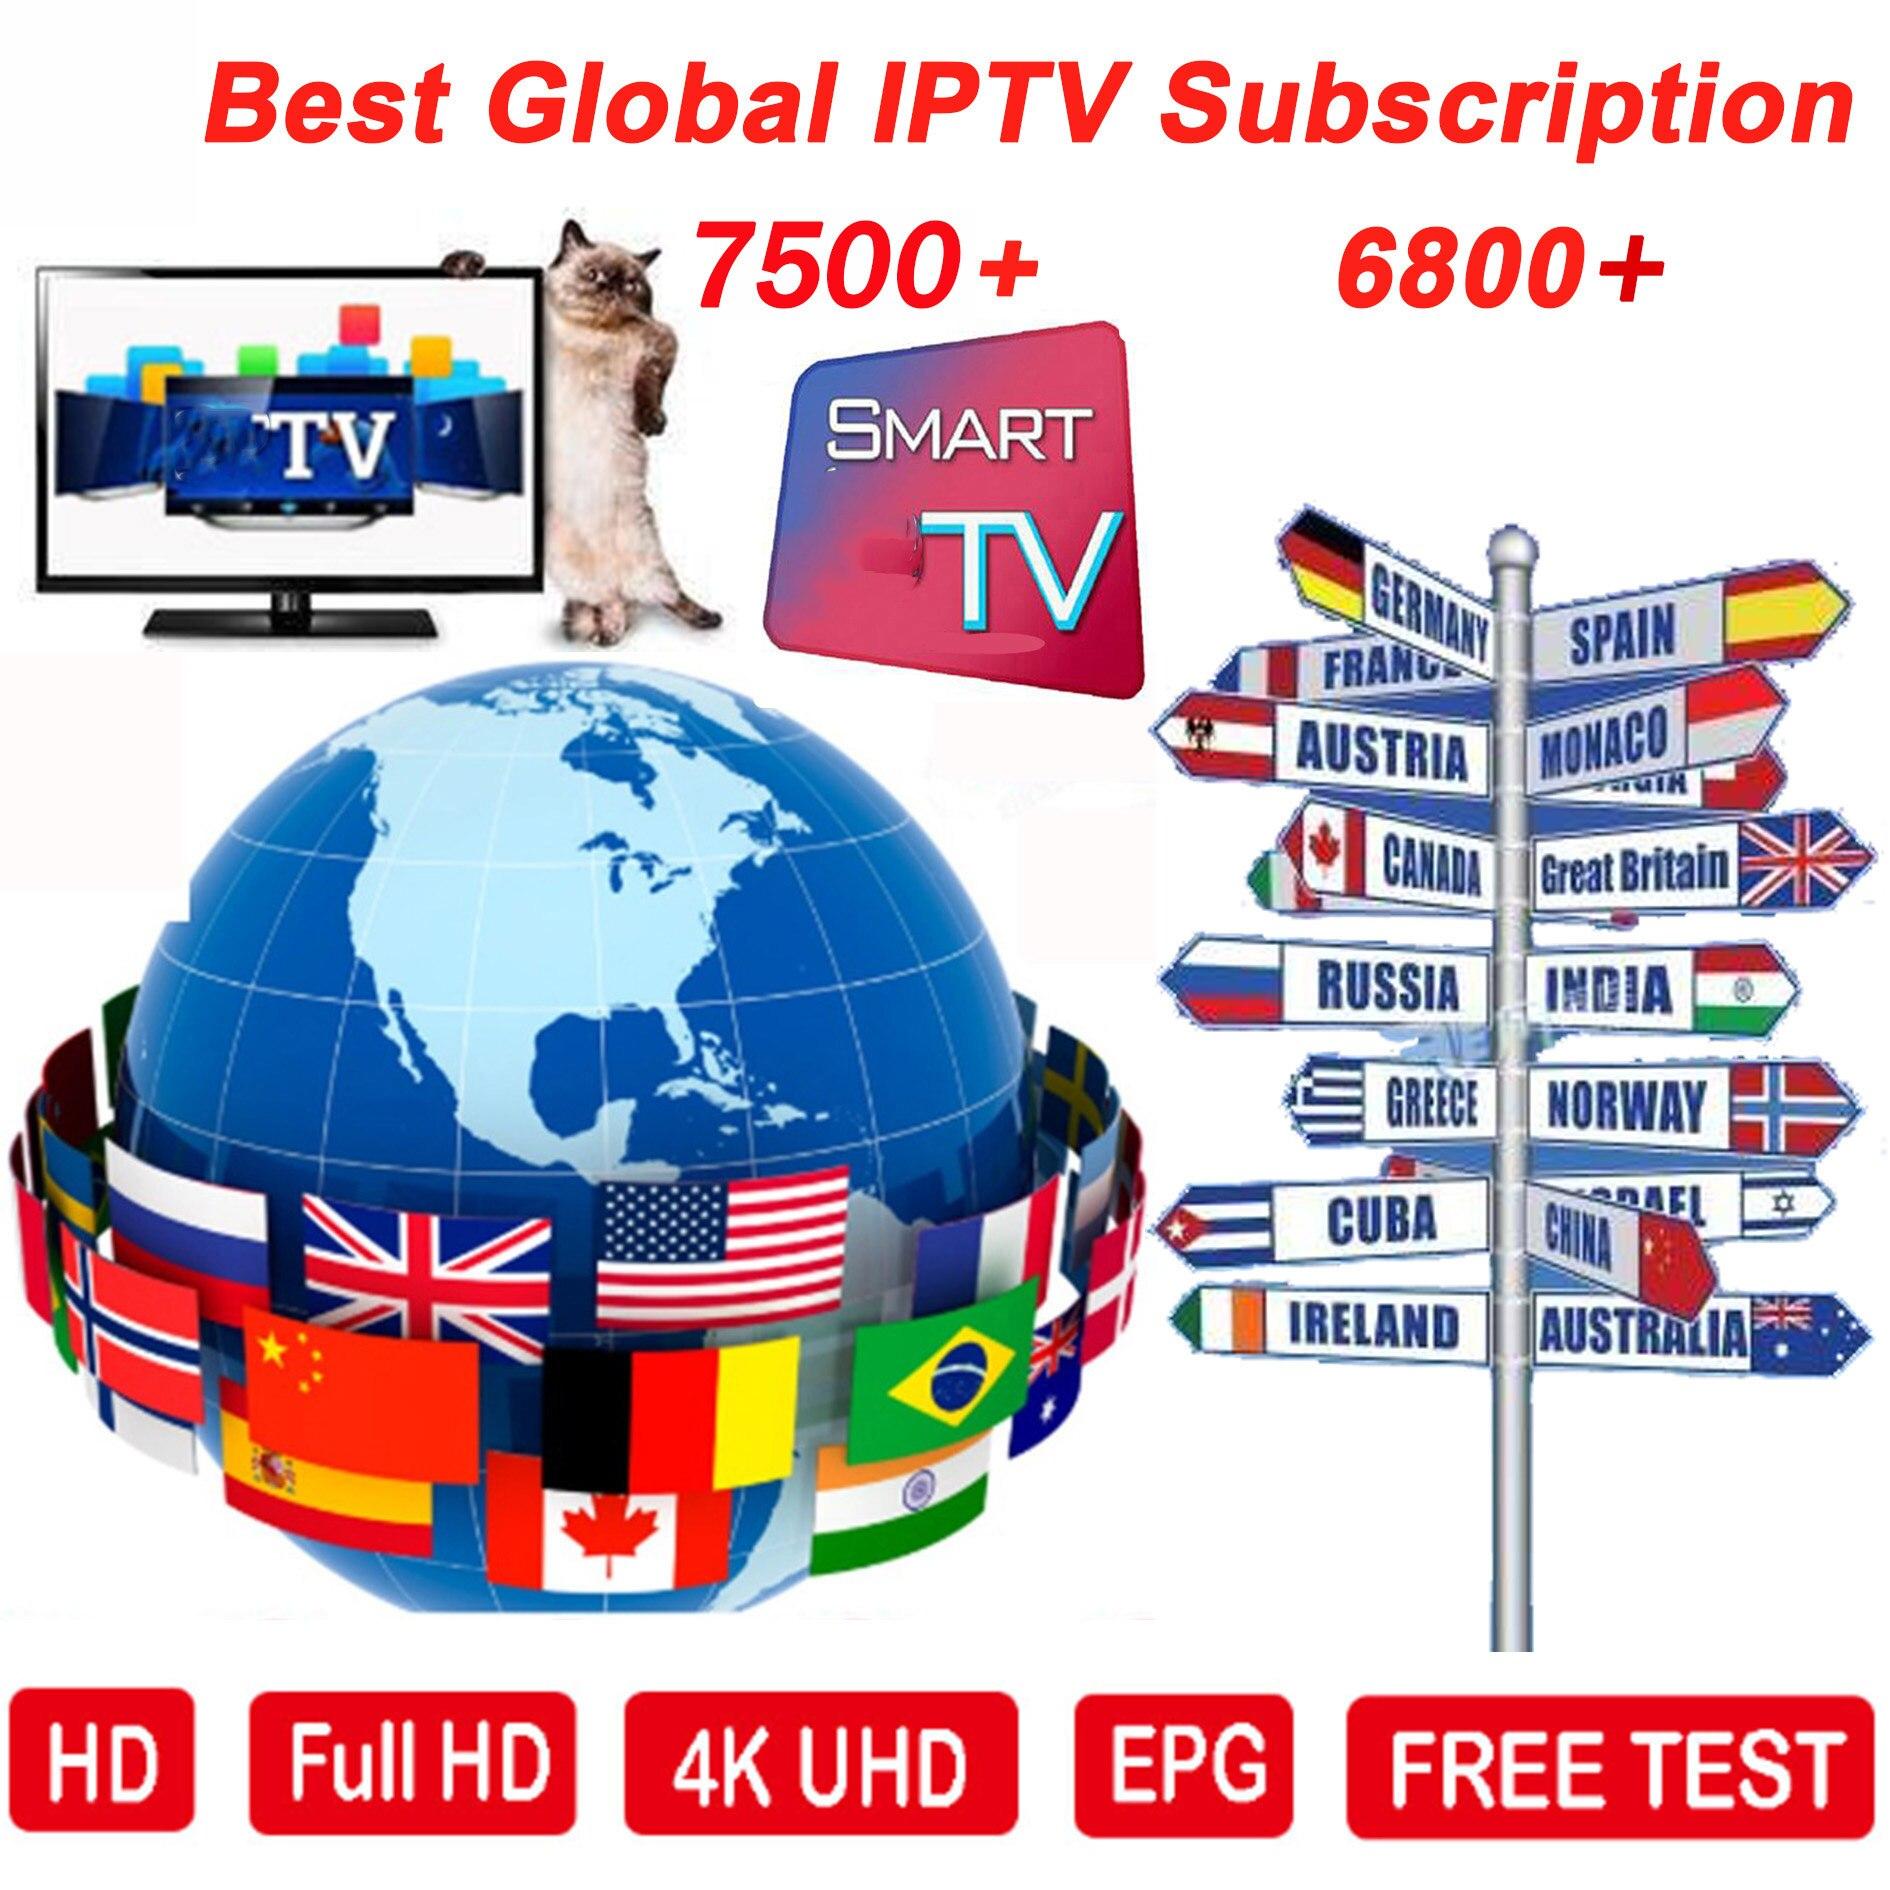 HD World 1PTV Tv Program MOV 4K HD Best For Europe Arabic Asian Africa Latino America Android M3U 1PTV Subscription